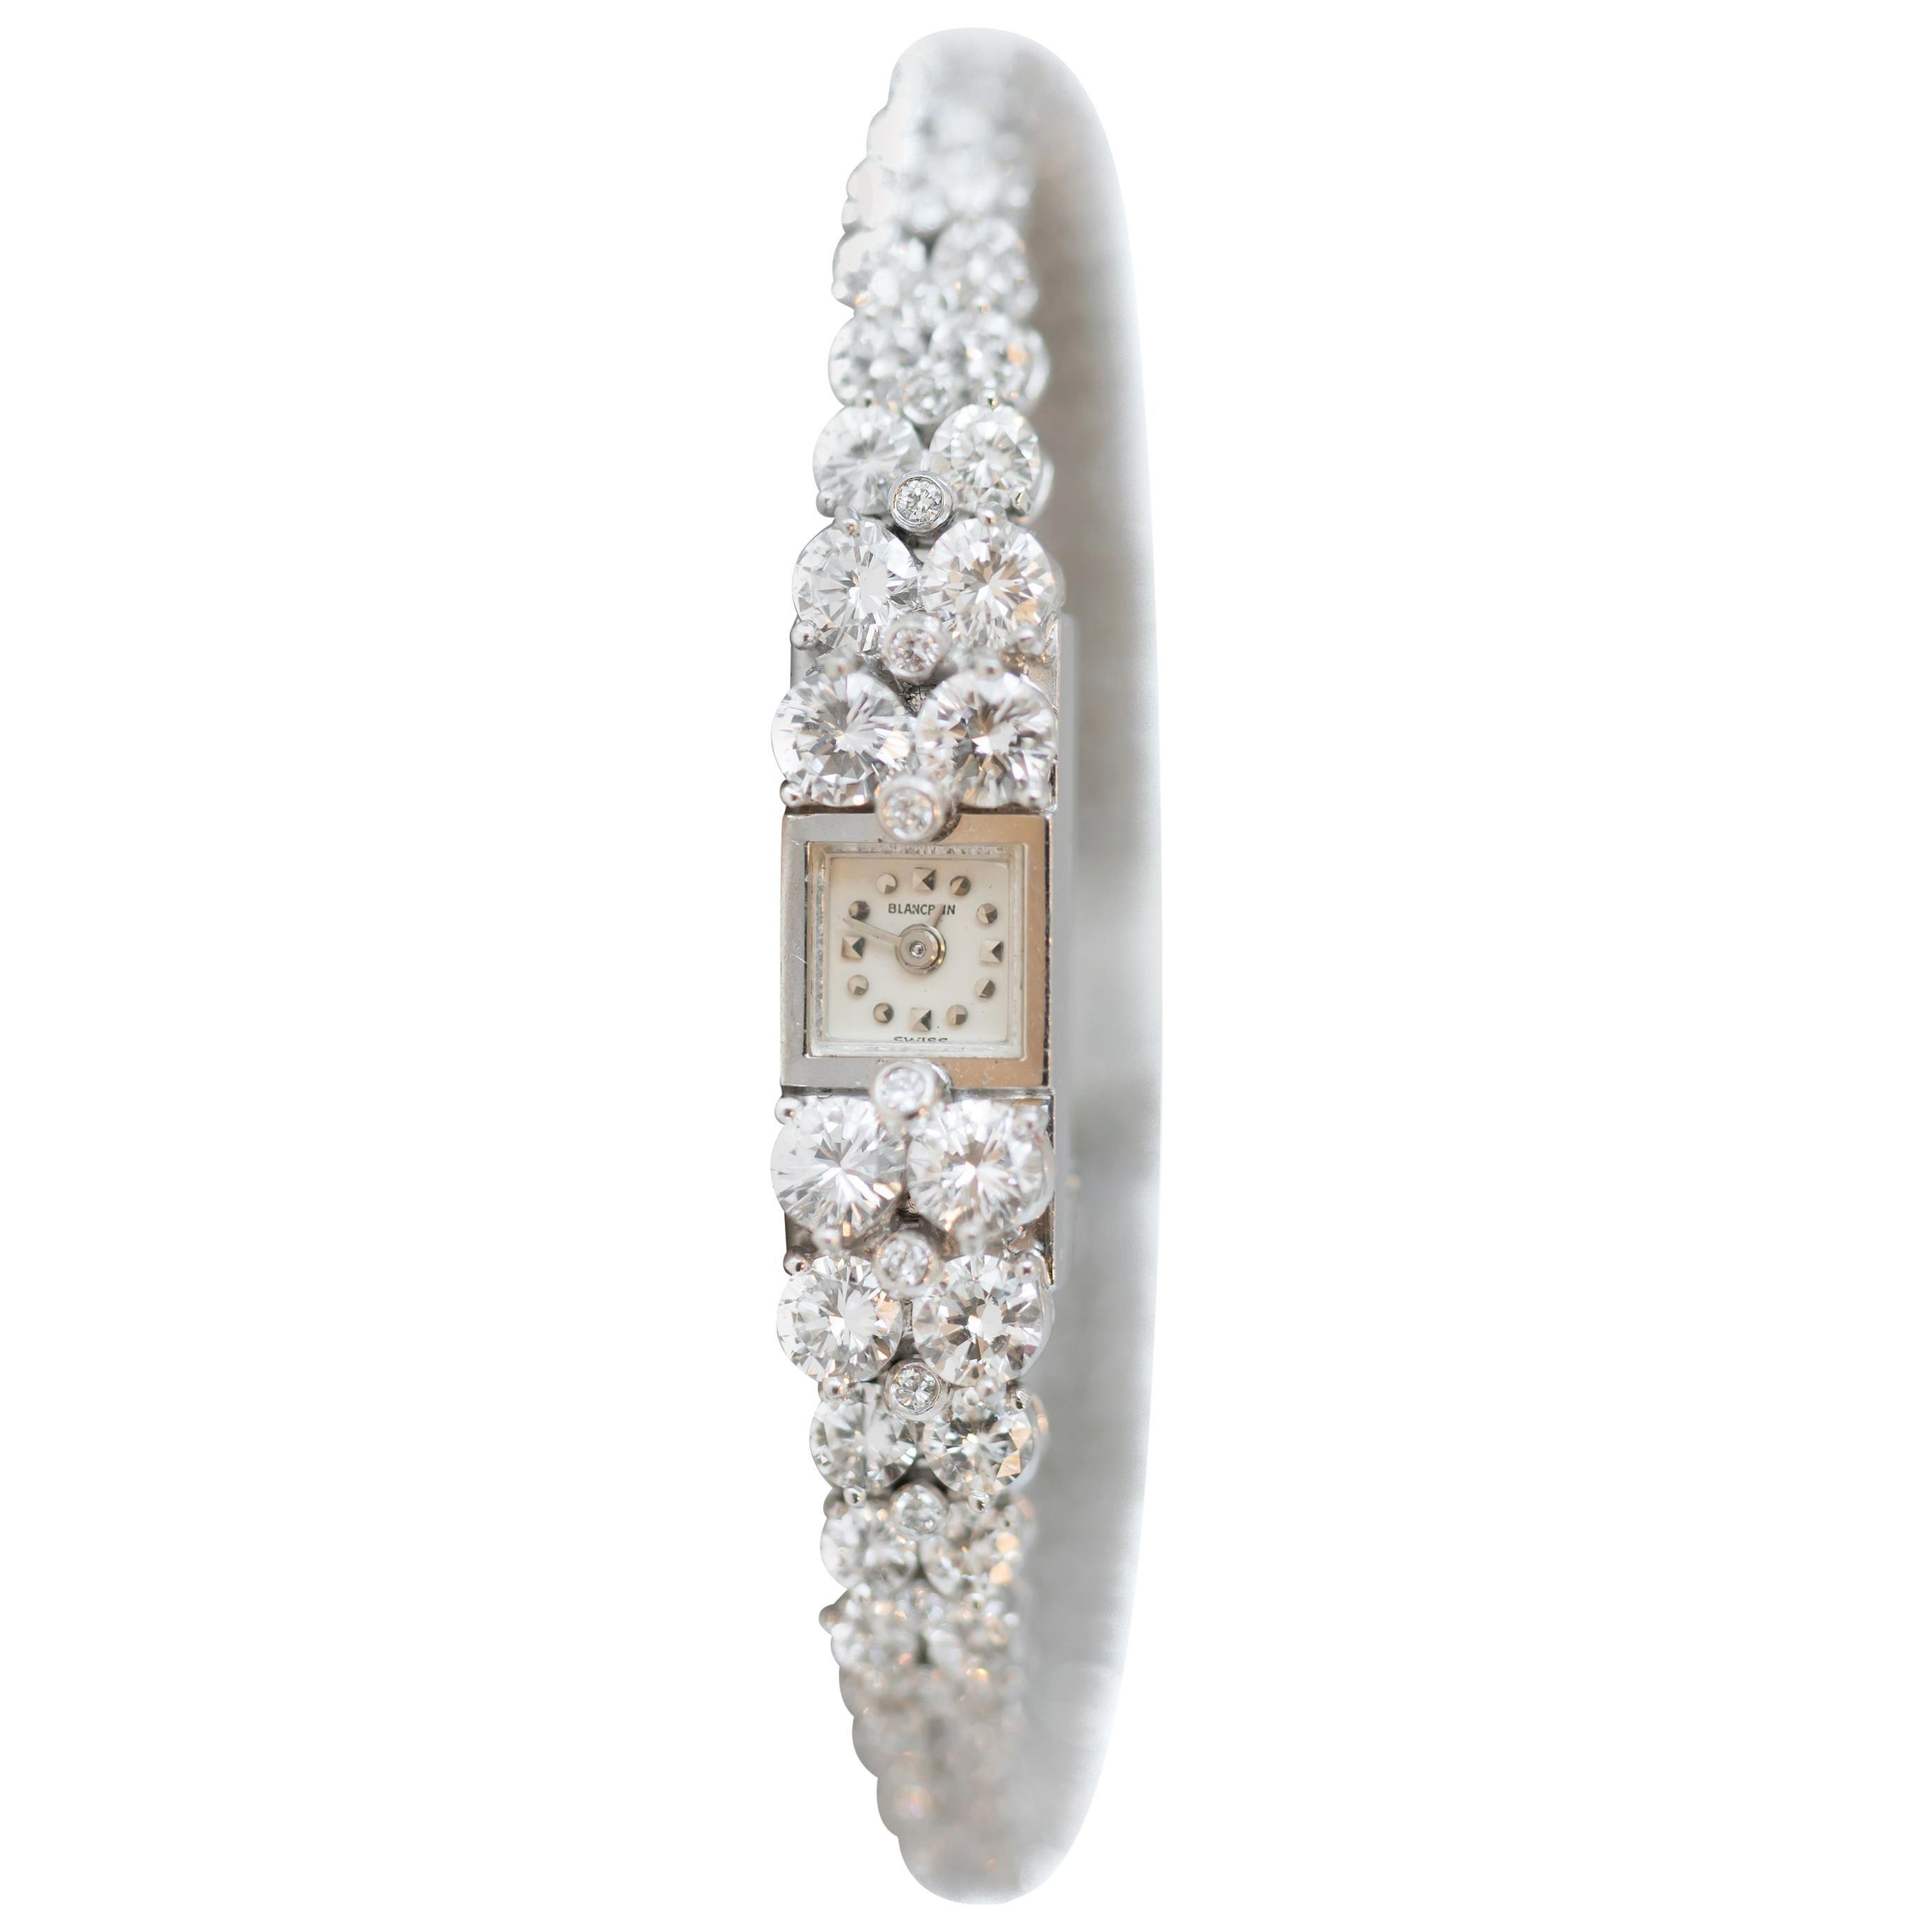 1940s Art Deco Blancpain 8 Carat Total Diamond and Platinum Ladies Wrist Watch